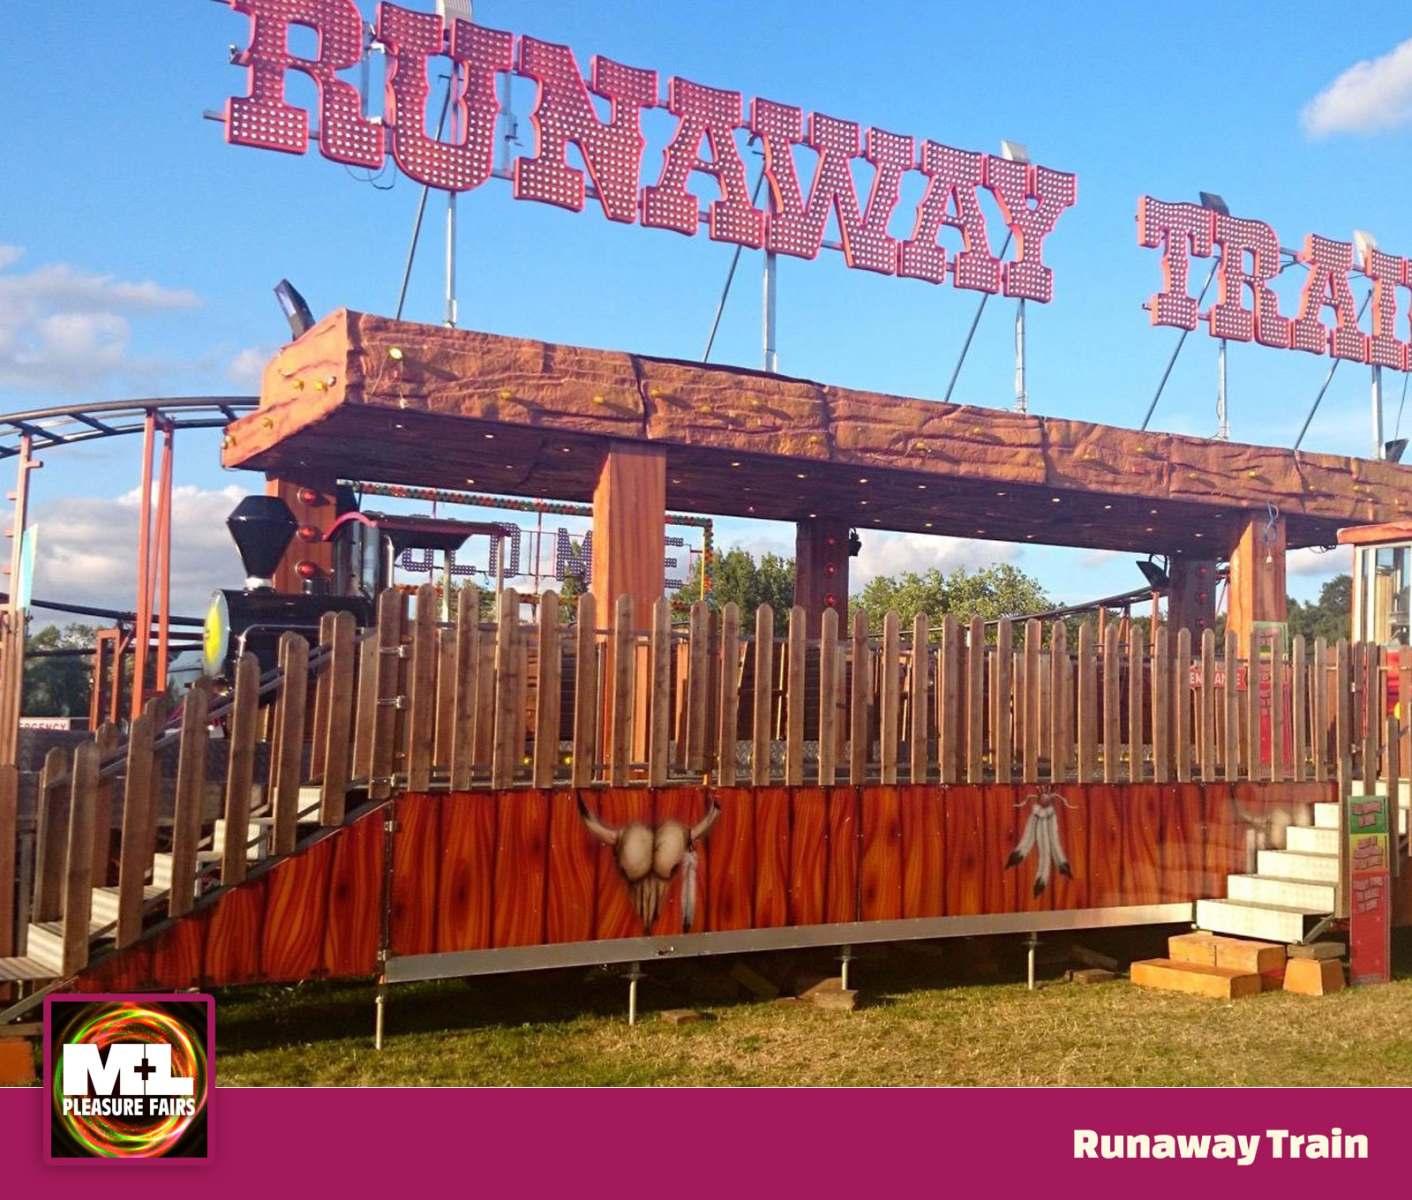 Runaway Train Ride Image